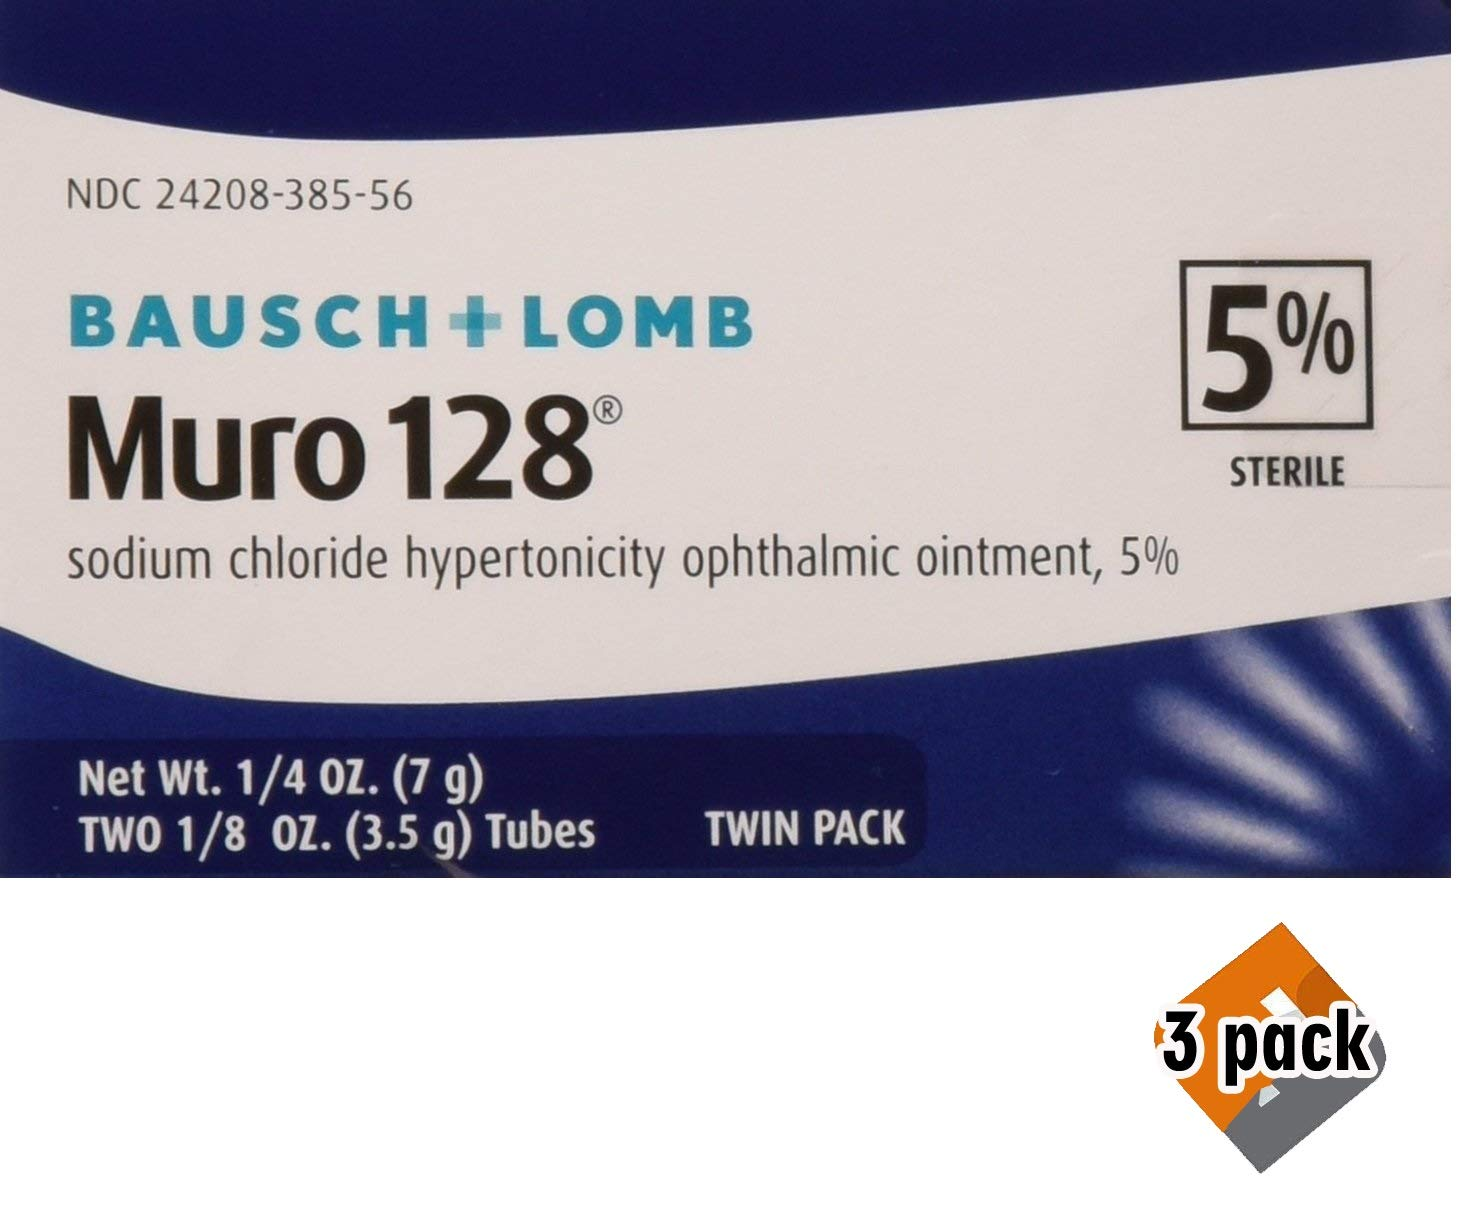 Muro 128 5 Percent 0.0 Twin Pack 2X1/8 OZ, 3 Pack